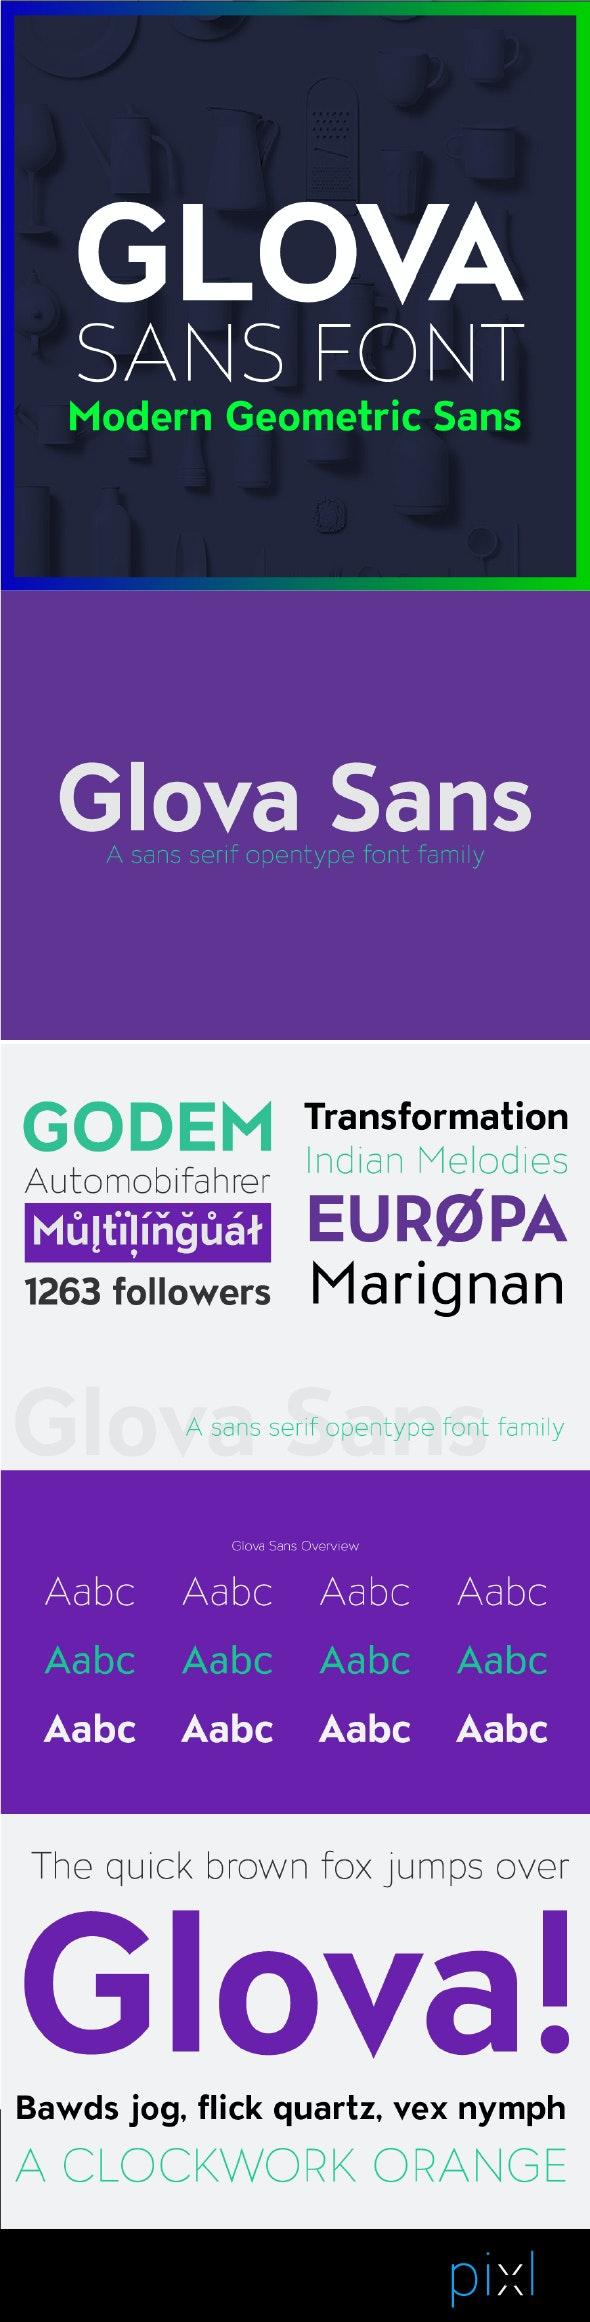 Glova Sans Font - Miscellaneous Sans-Serif